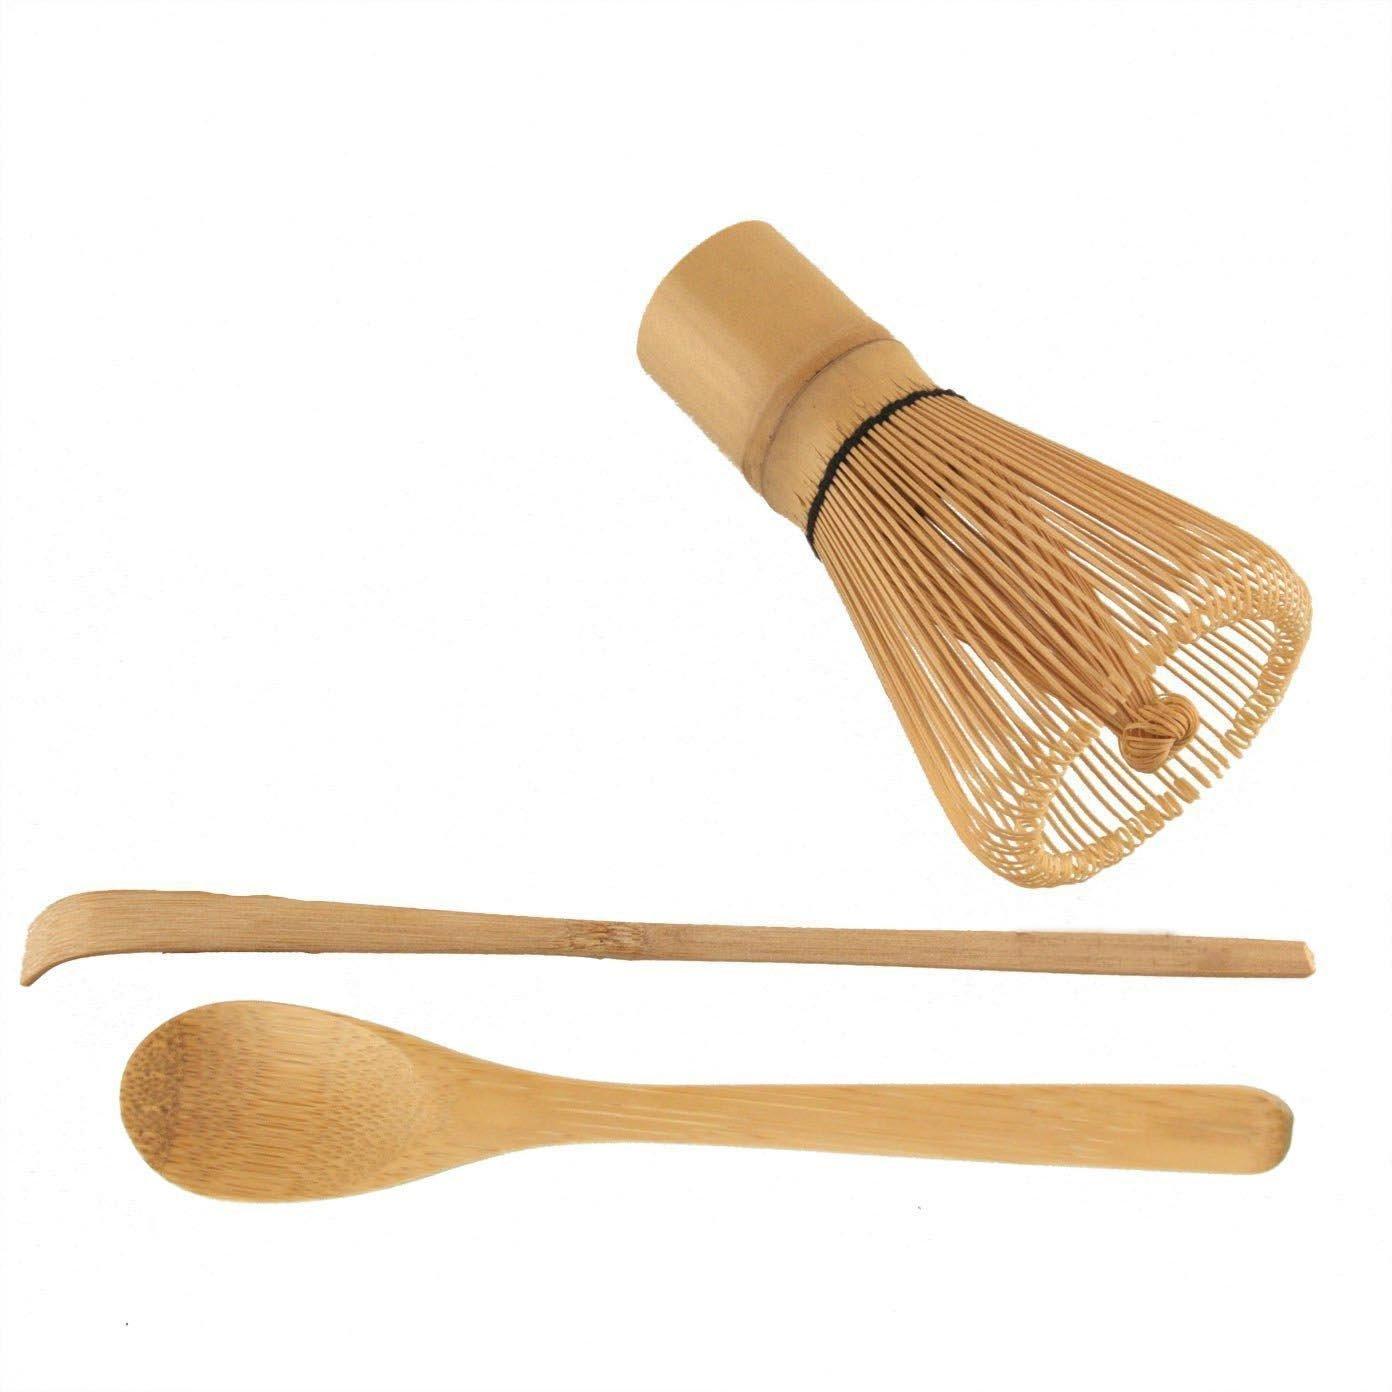 JapanBargain S3702+3805, Bambooo Matcha Tea Ceremony Set 100 Prong Chasen Whisk Tea Scoop Chashaku Tea Spoon, Set of 25